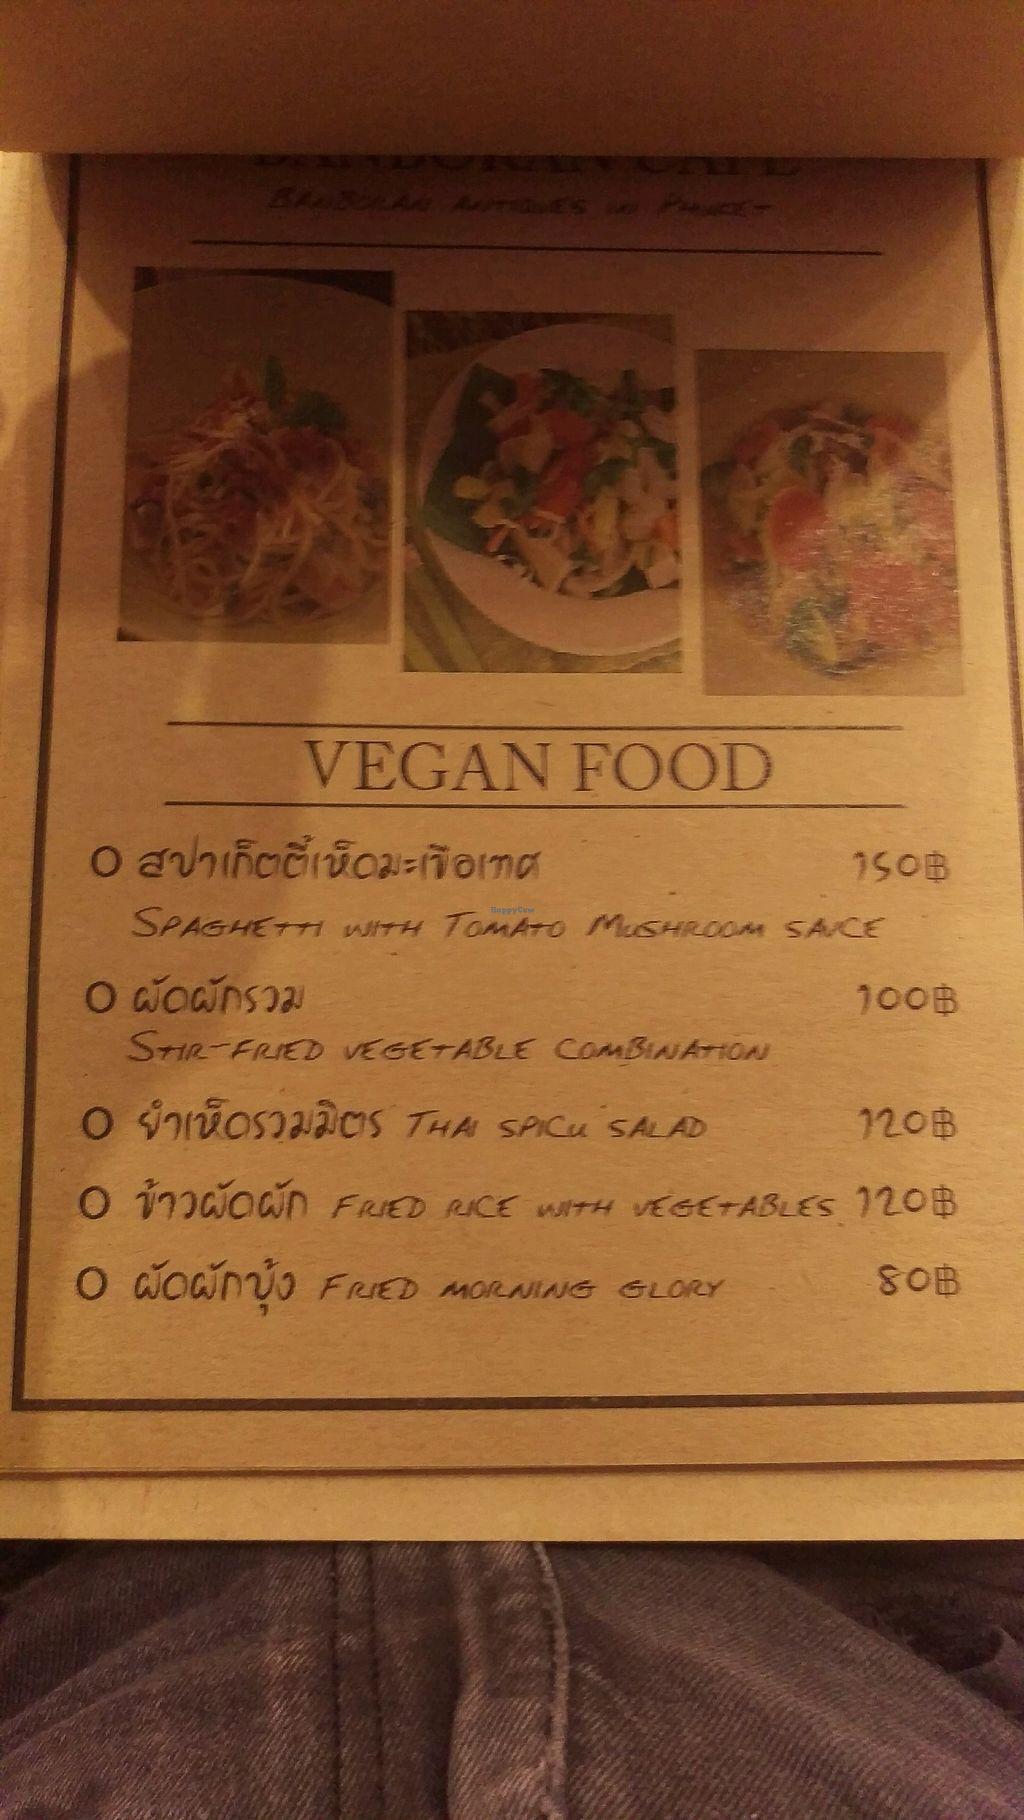 "Photo of Banboran Cafe  by <a href=""/members/profile/MarjoDsgln"">MarjoDsgln</a> <br/>vegan menu 1 <br/> February 19, 2018  - <a href='/contact/abuse/image/88108/361121'>Report</a>"